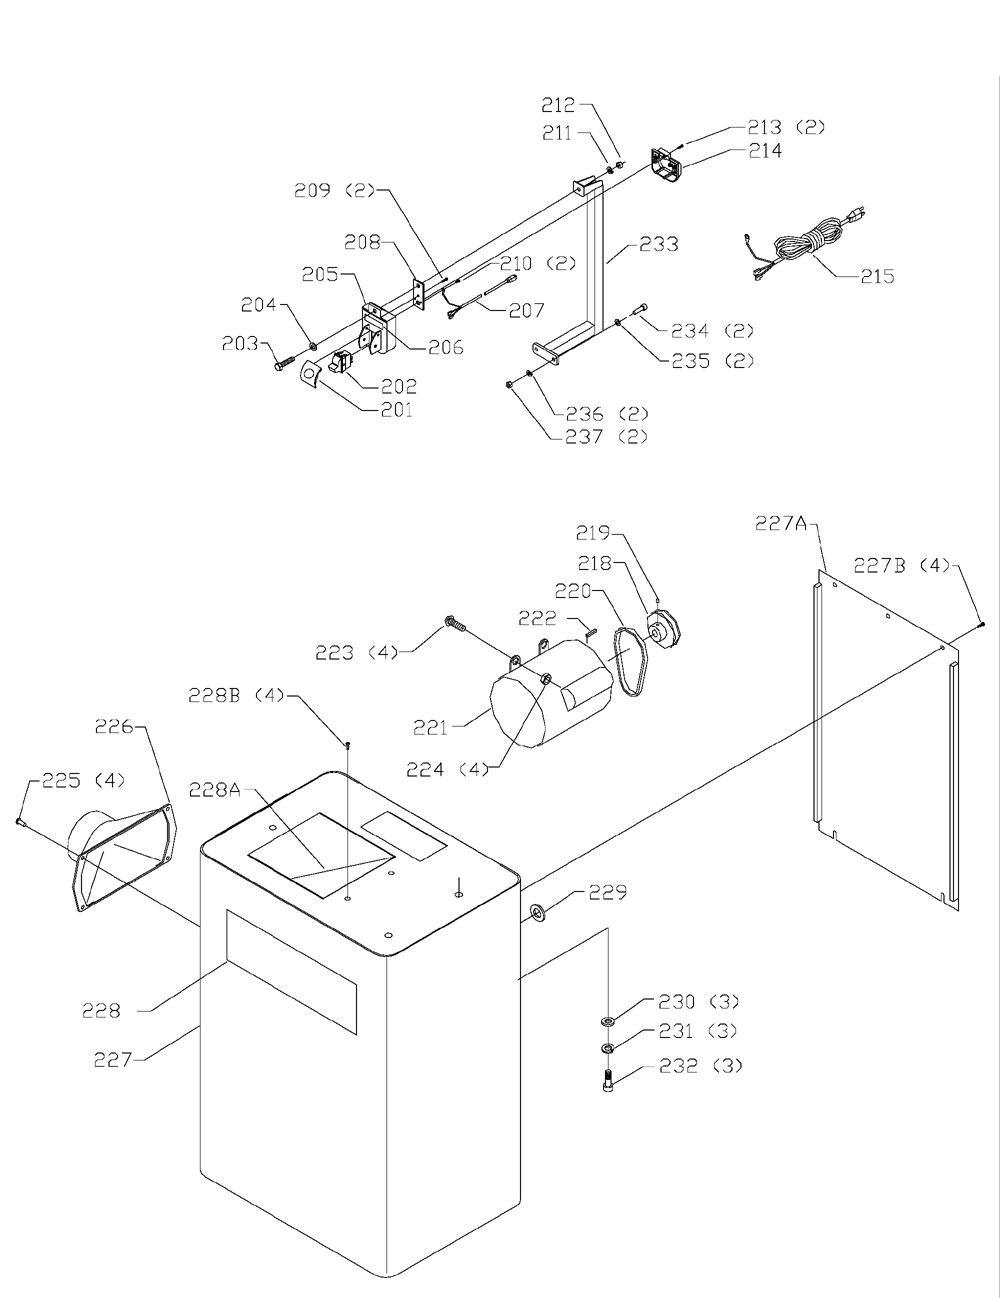 Baldwin door hardware replacement parts wiring diagram and fuse box vauxhall vivaro